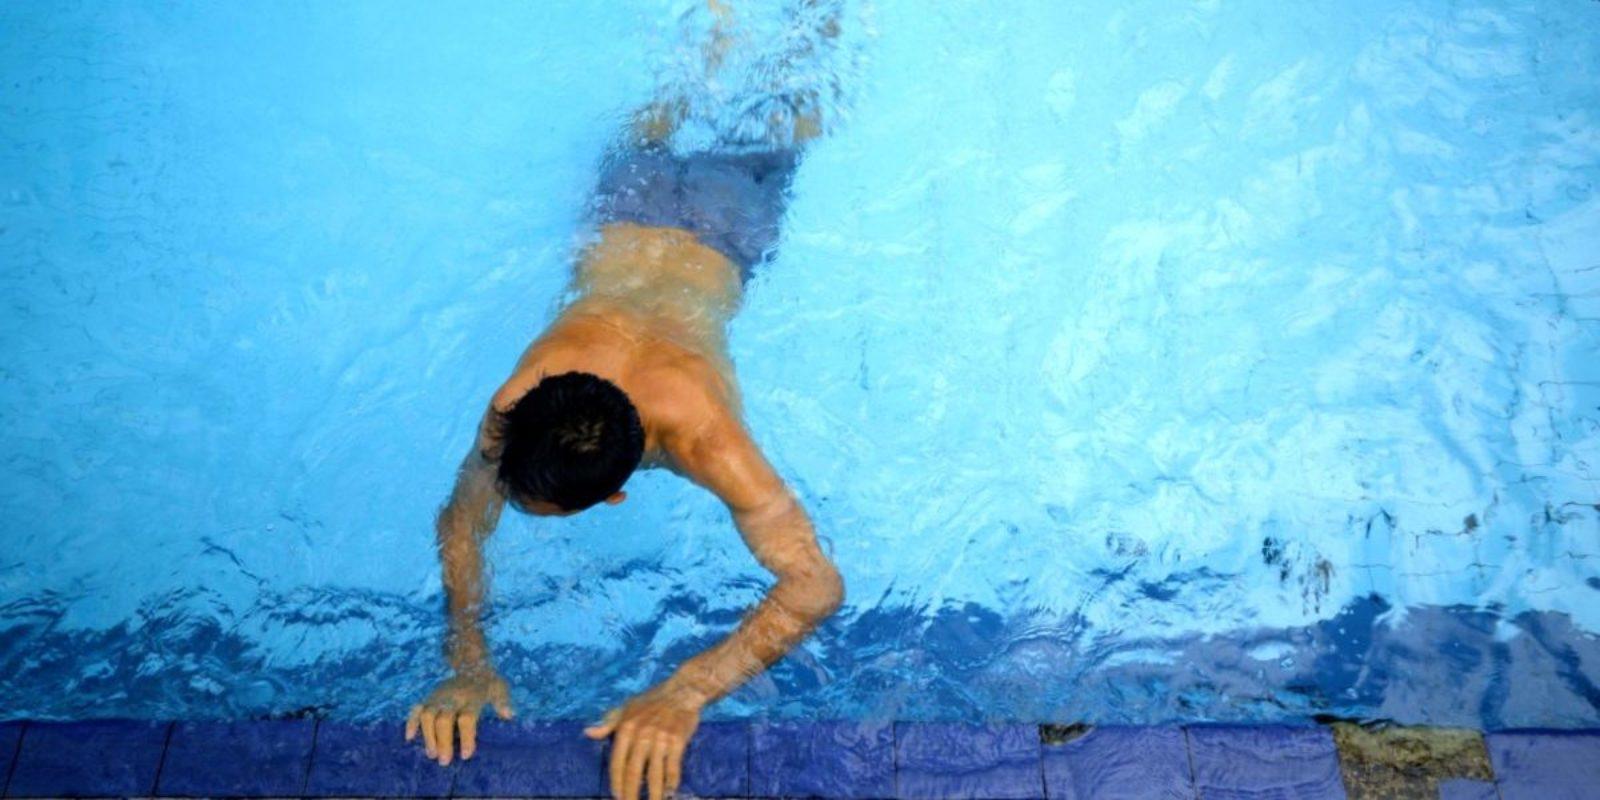 Najib, Refugiado afgano, nadando en Indonesia.